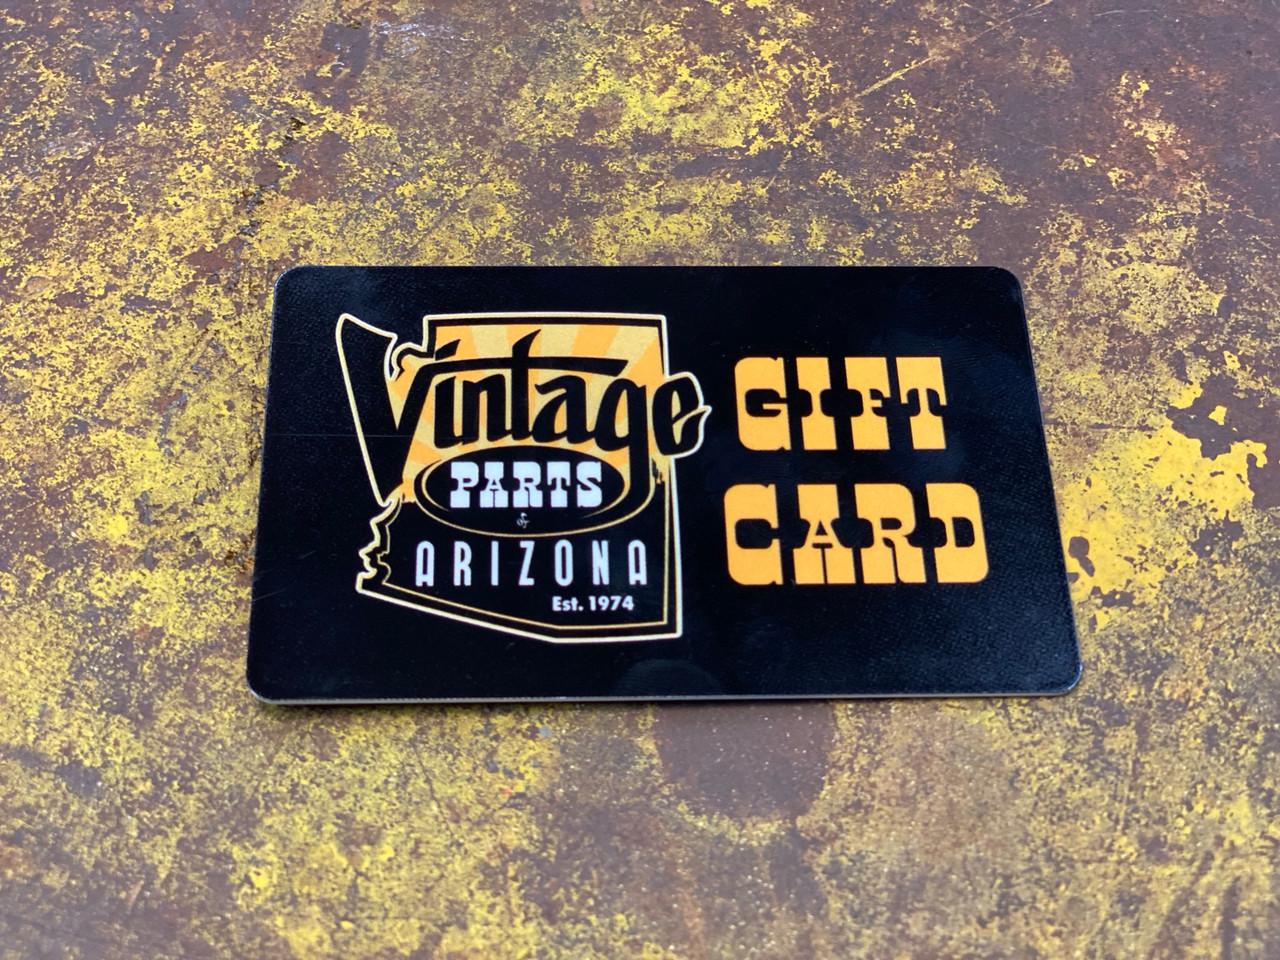 Vintage Parts of Arizona Gift Card